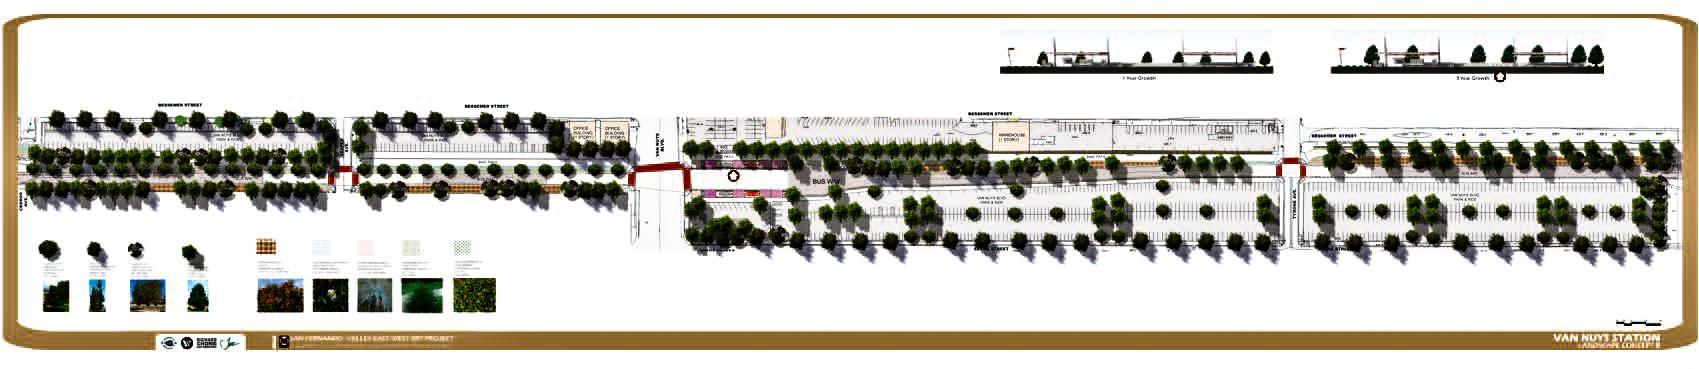 BRT_VANNUYS TAP B.jpg